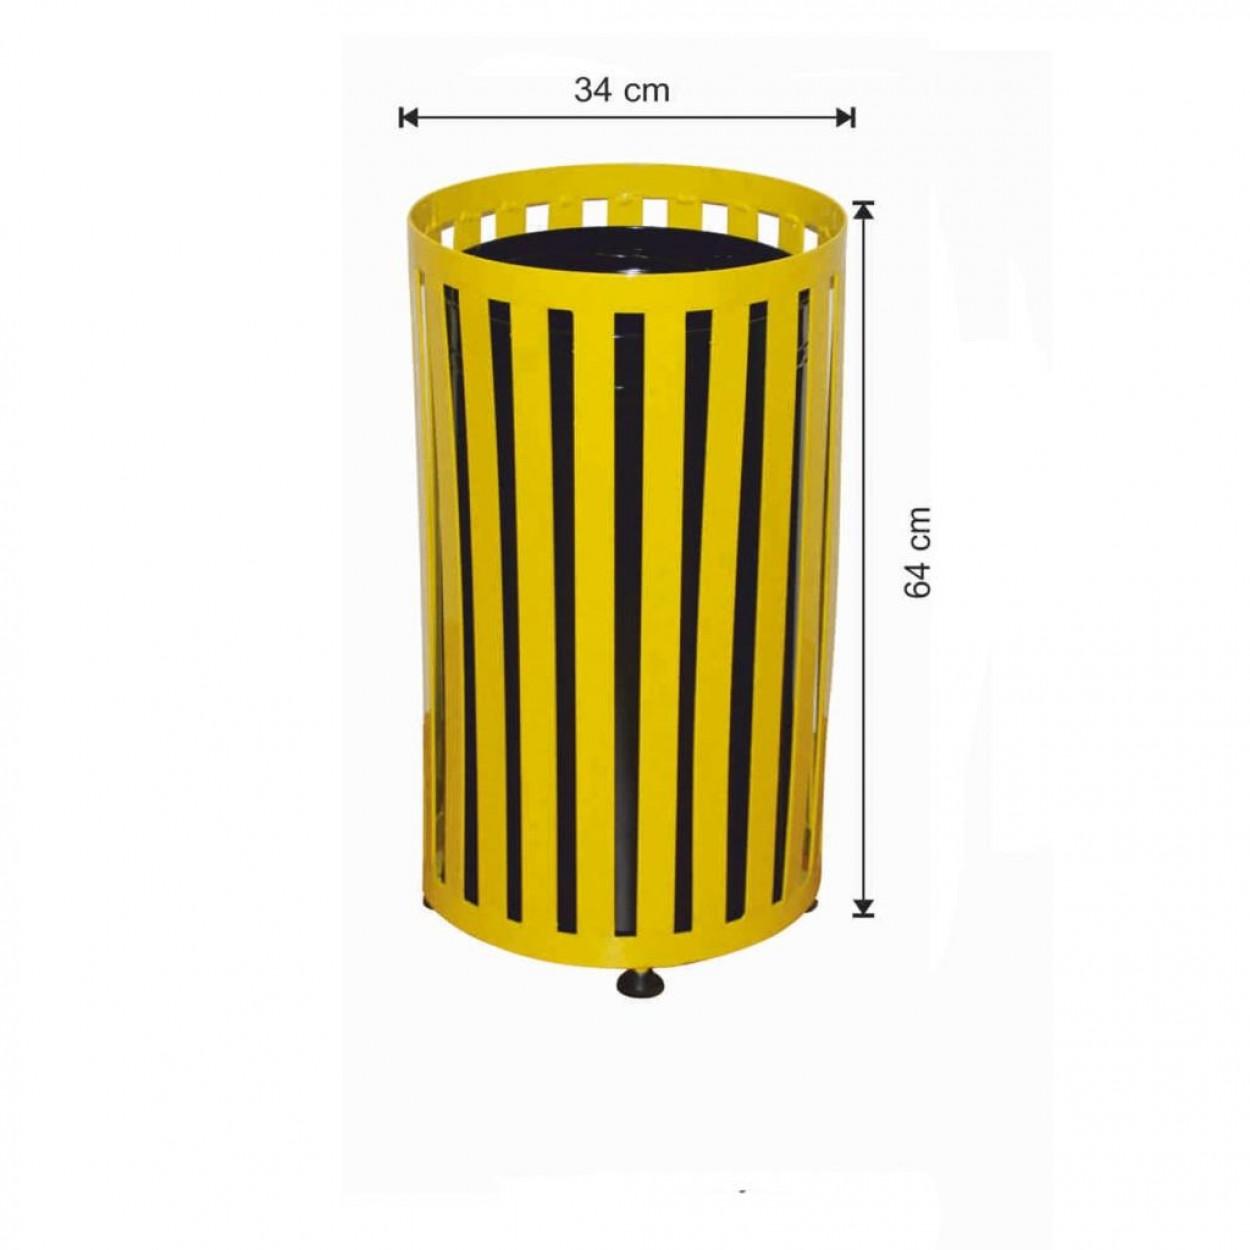 Dış Alan Çöp Kovası Yuvarlak Sarı Renk